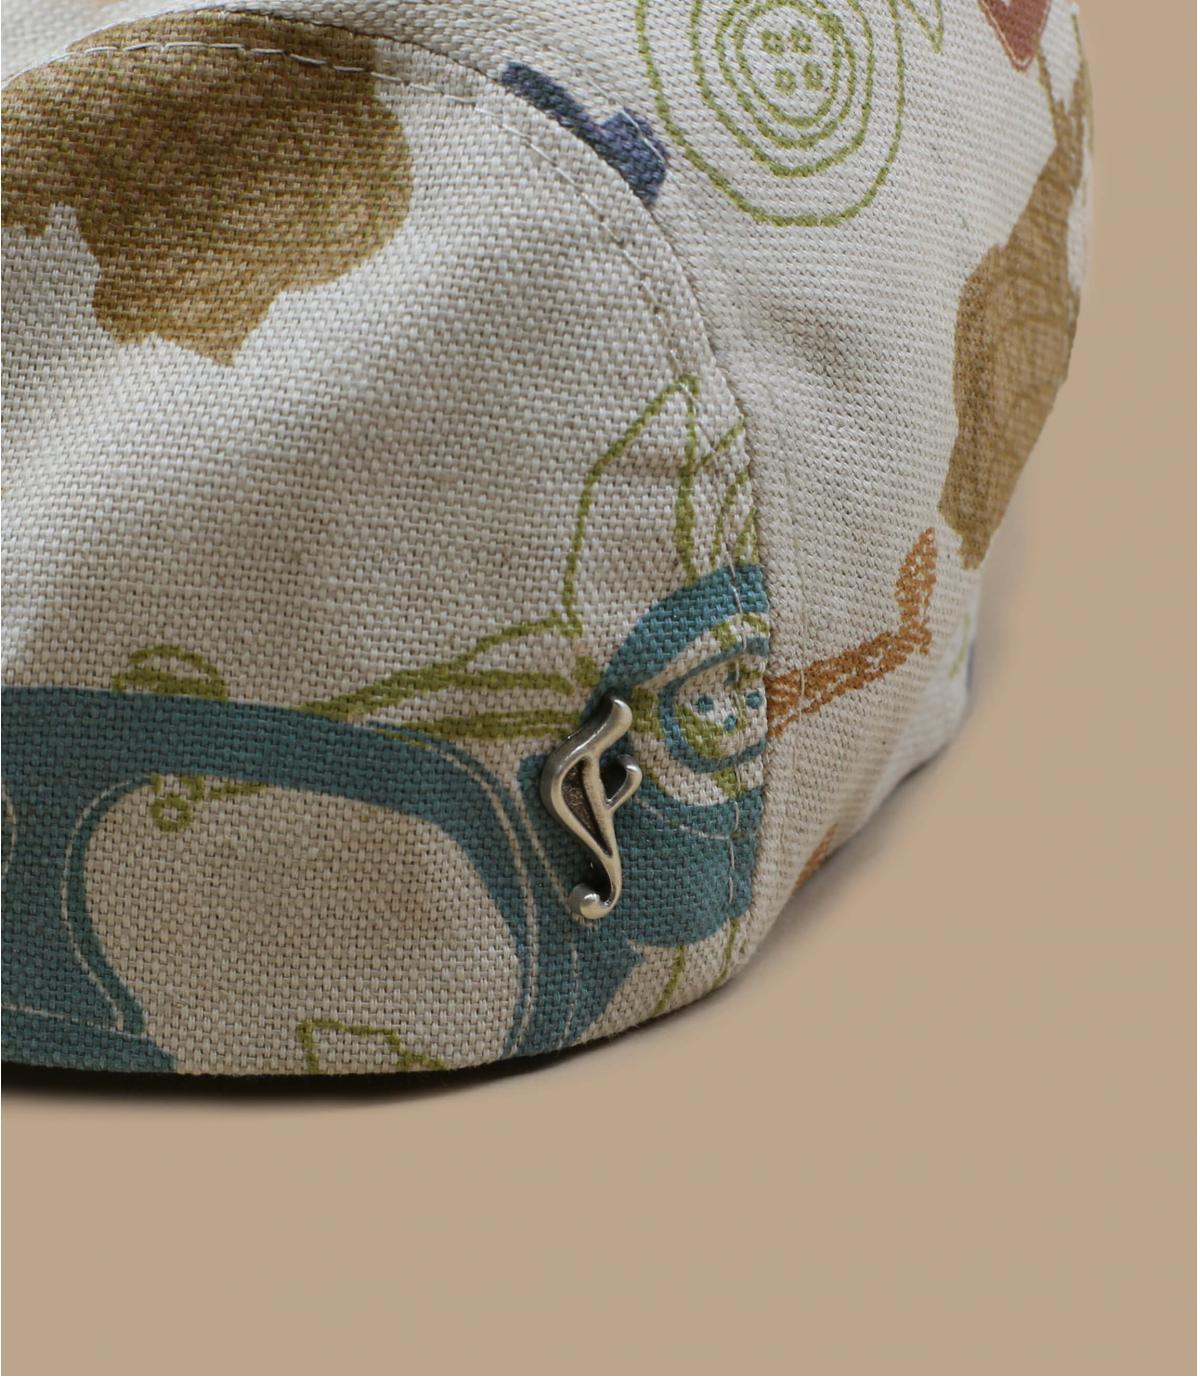 béret vespa